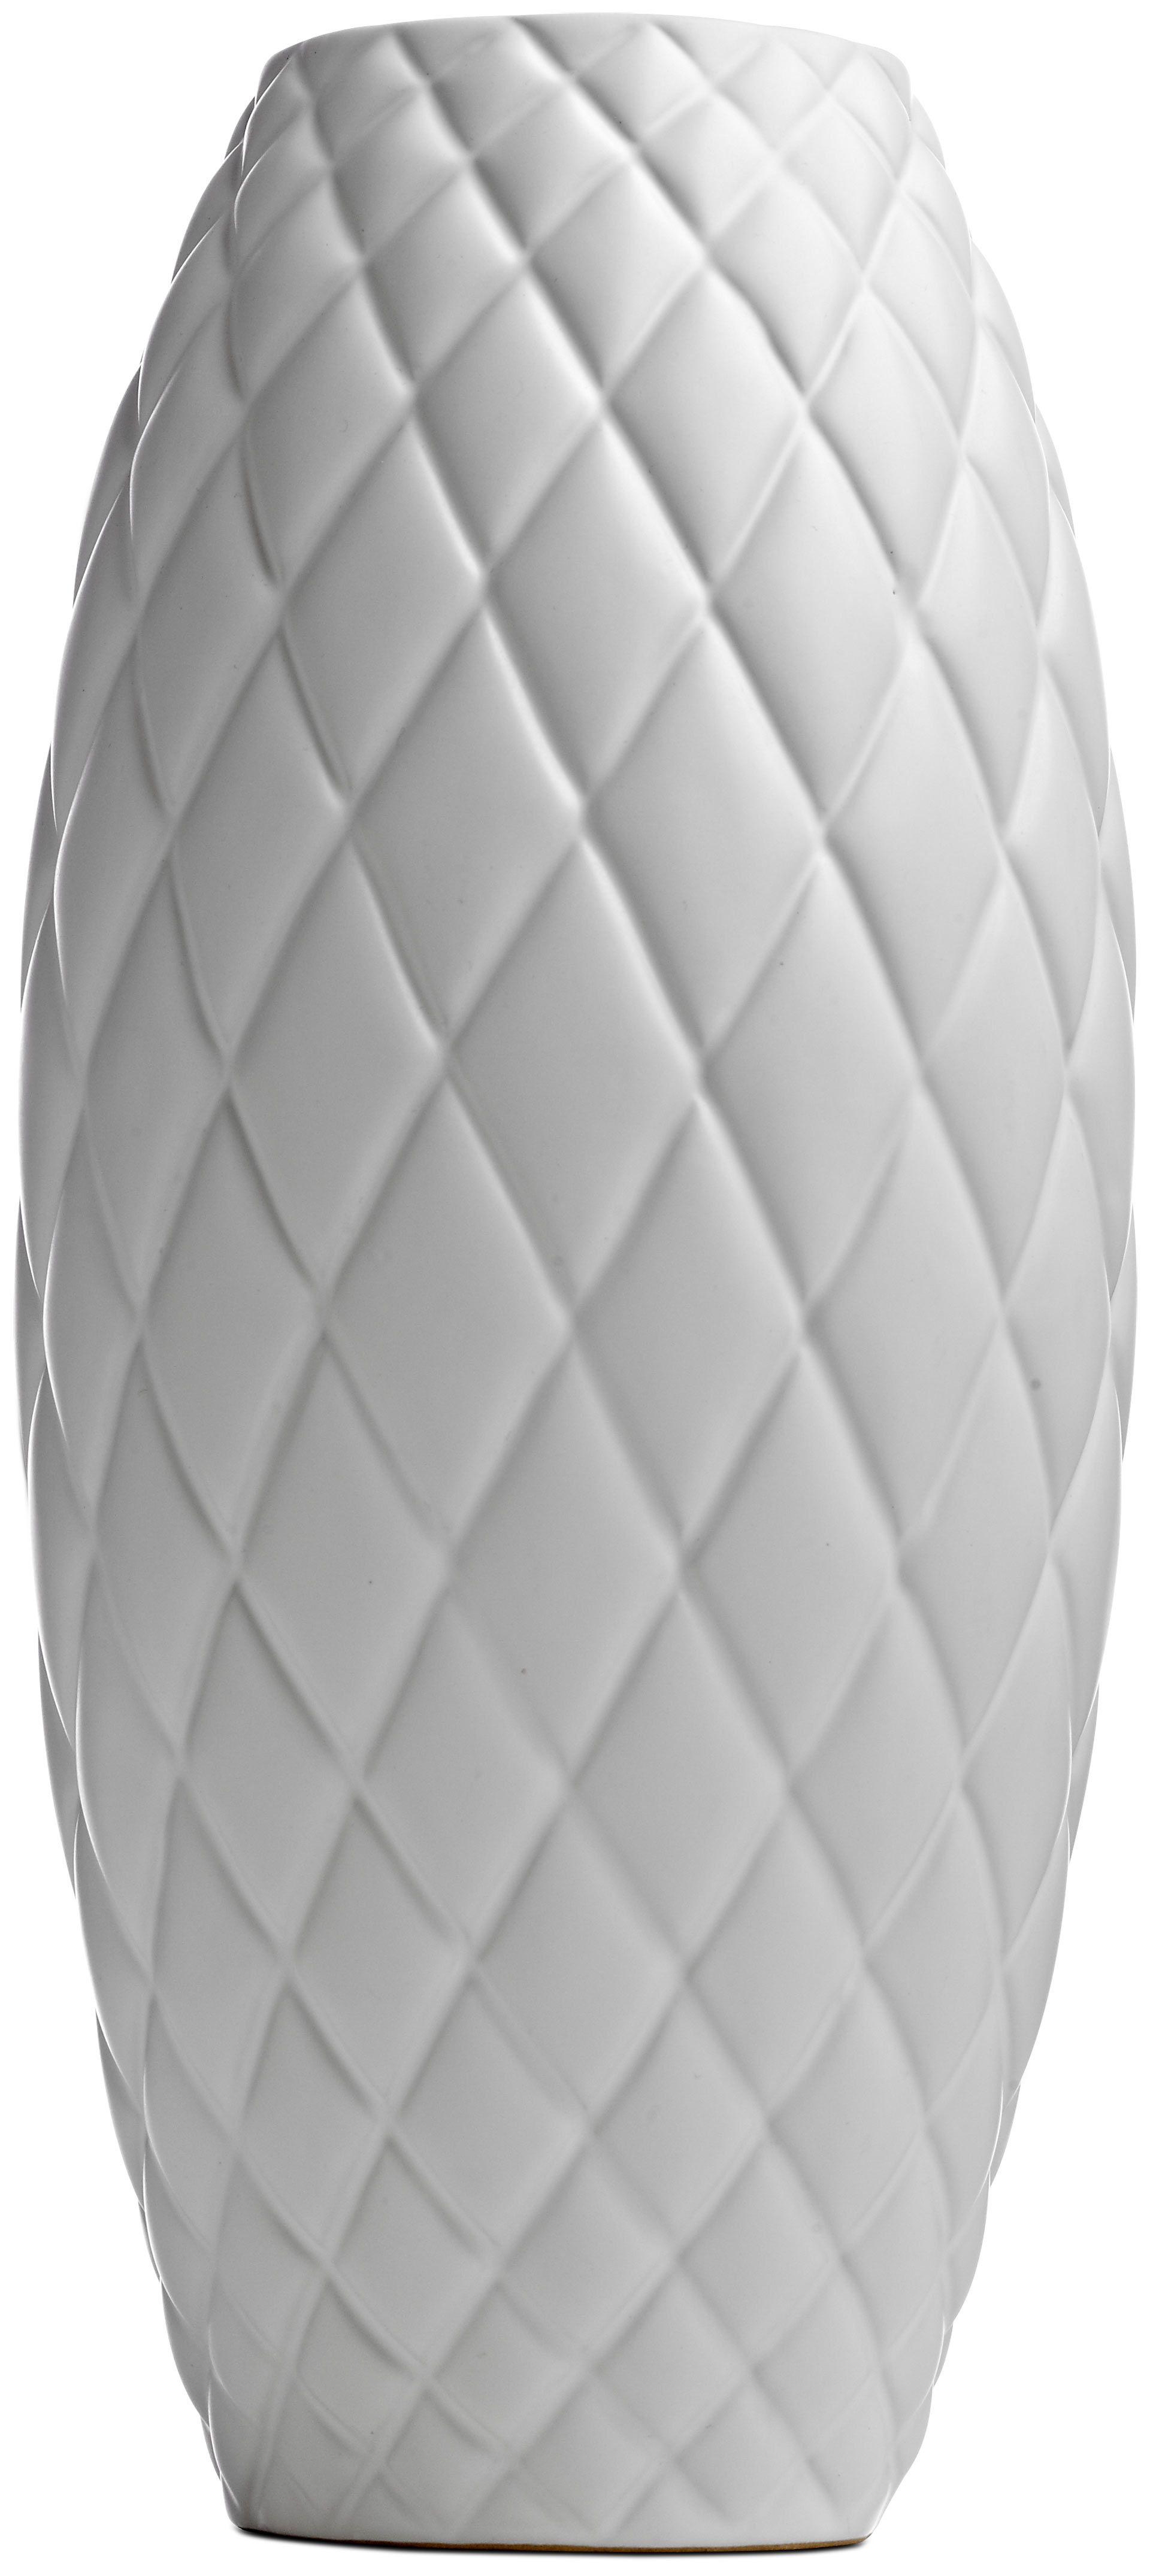 Vase quilted white stoneware ornamentation pinterest modern vase floridaeventfo Image collections